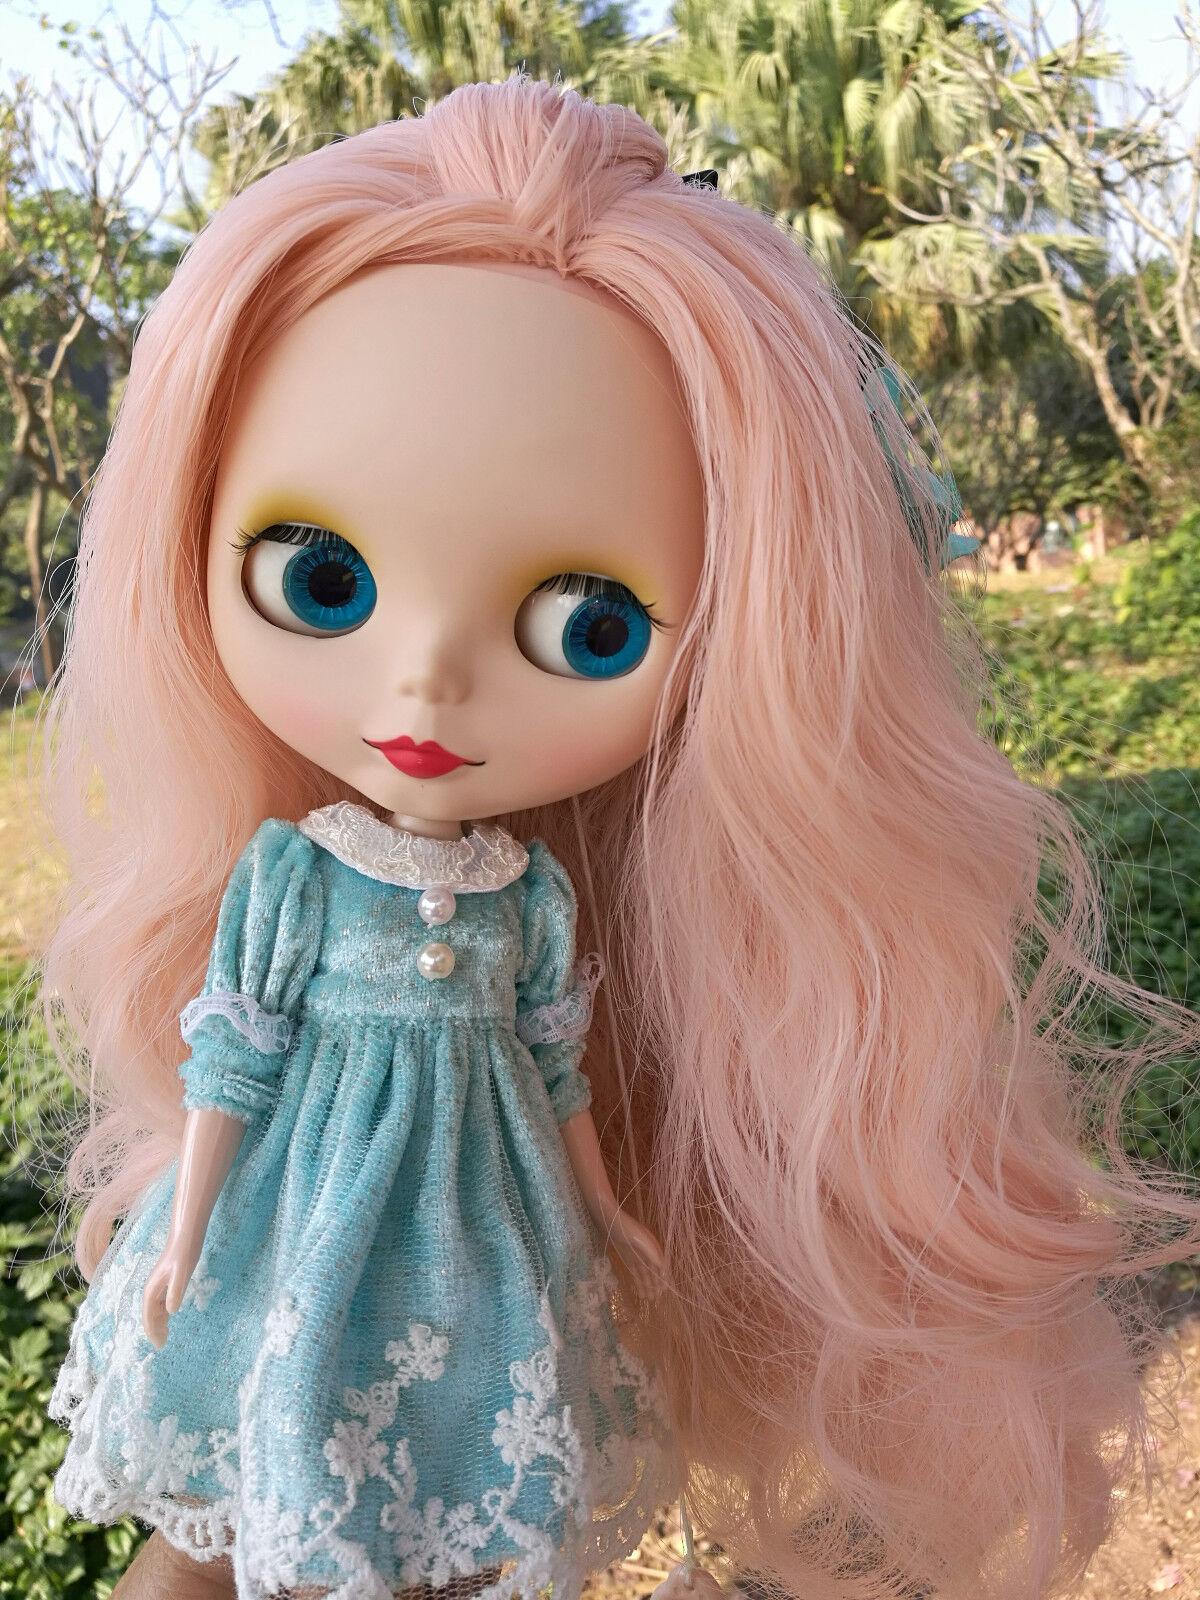 12  Neo Desnuda Muñeca Blythe Doll de fábrica Mate Cara Luz rosado Largo Cabello Rizado